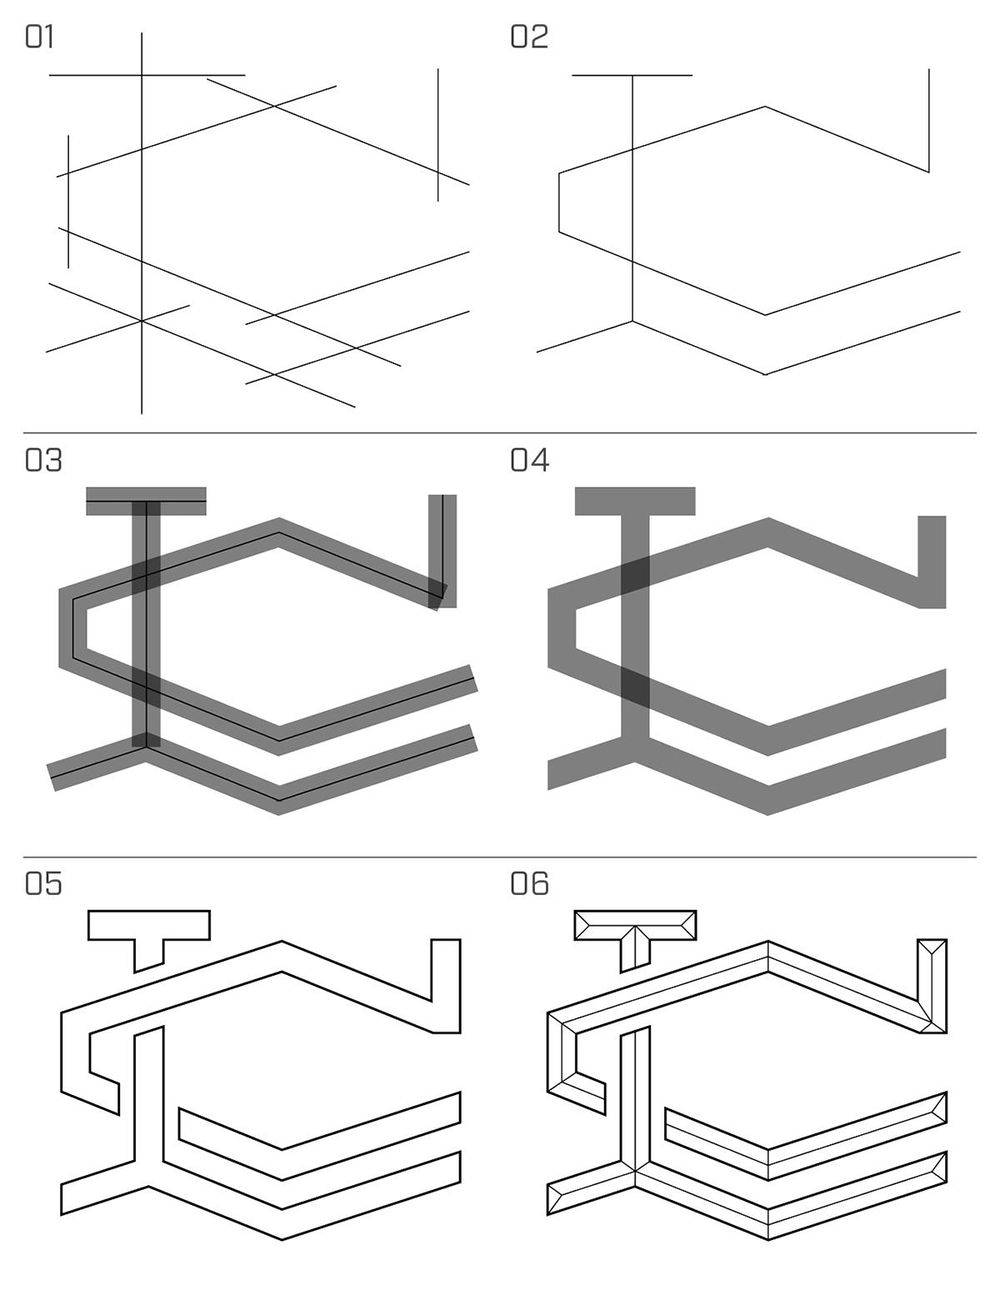 LC Monogram - image 11 - student project